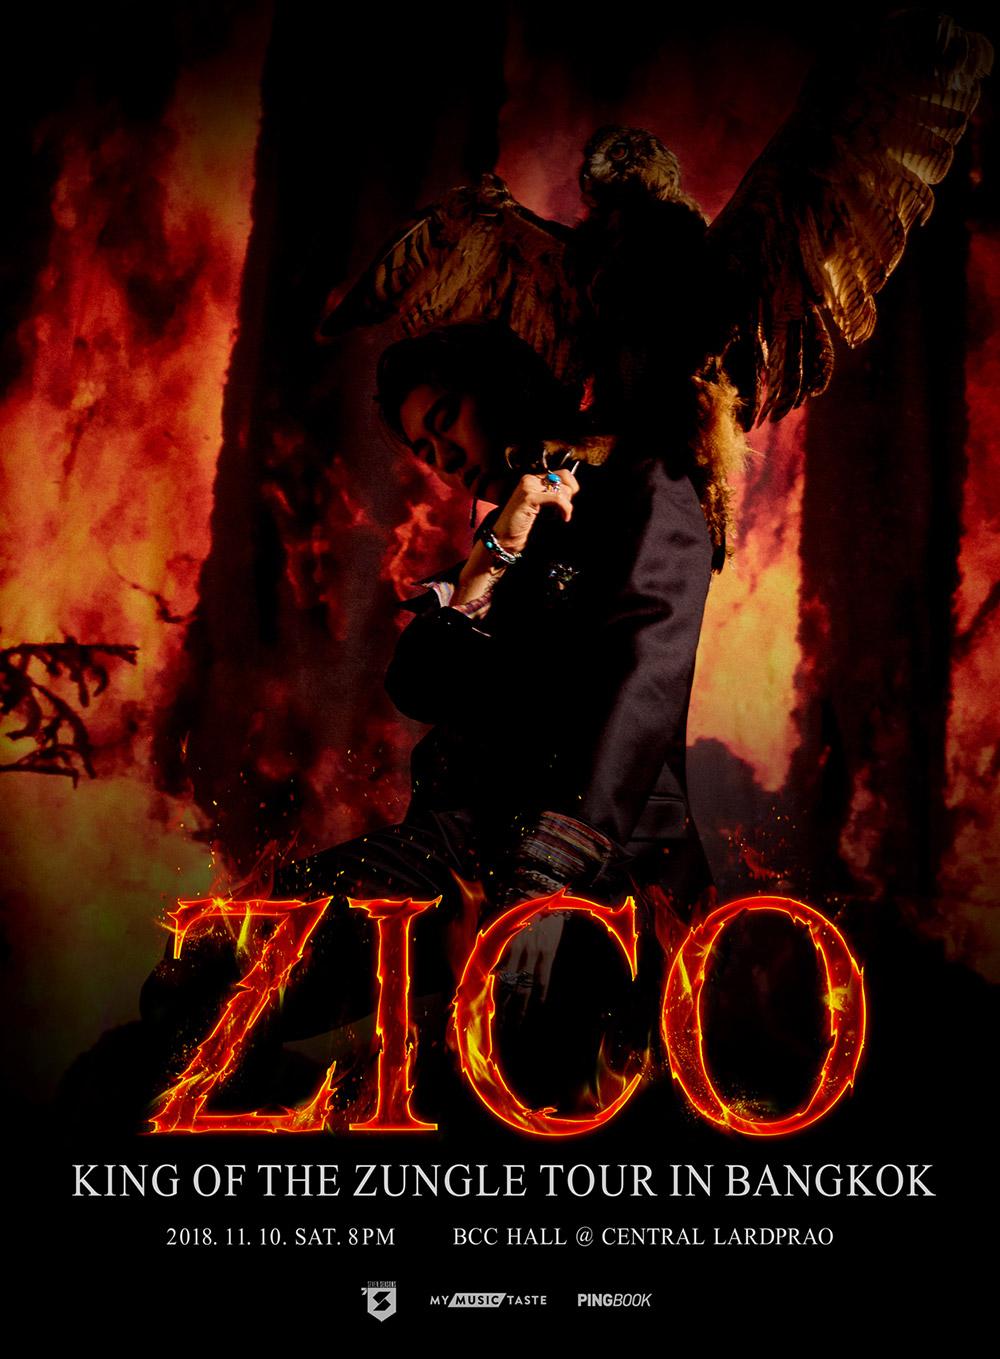 zico_poster